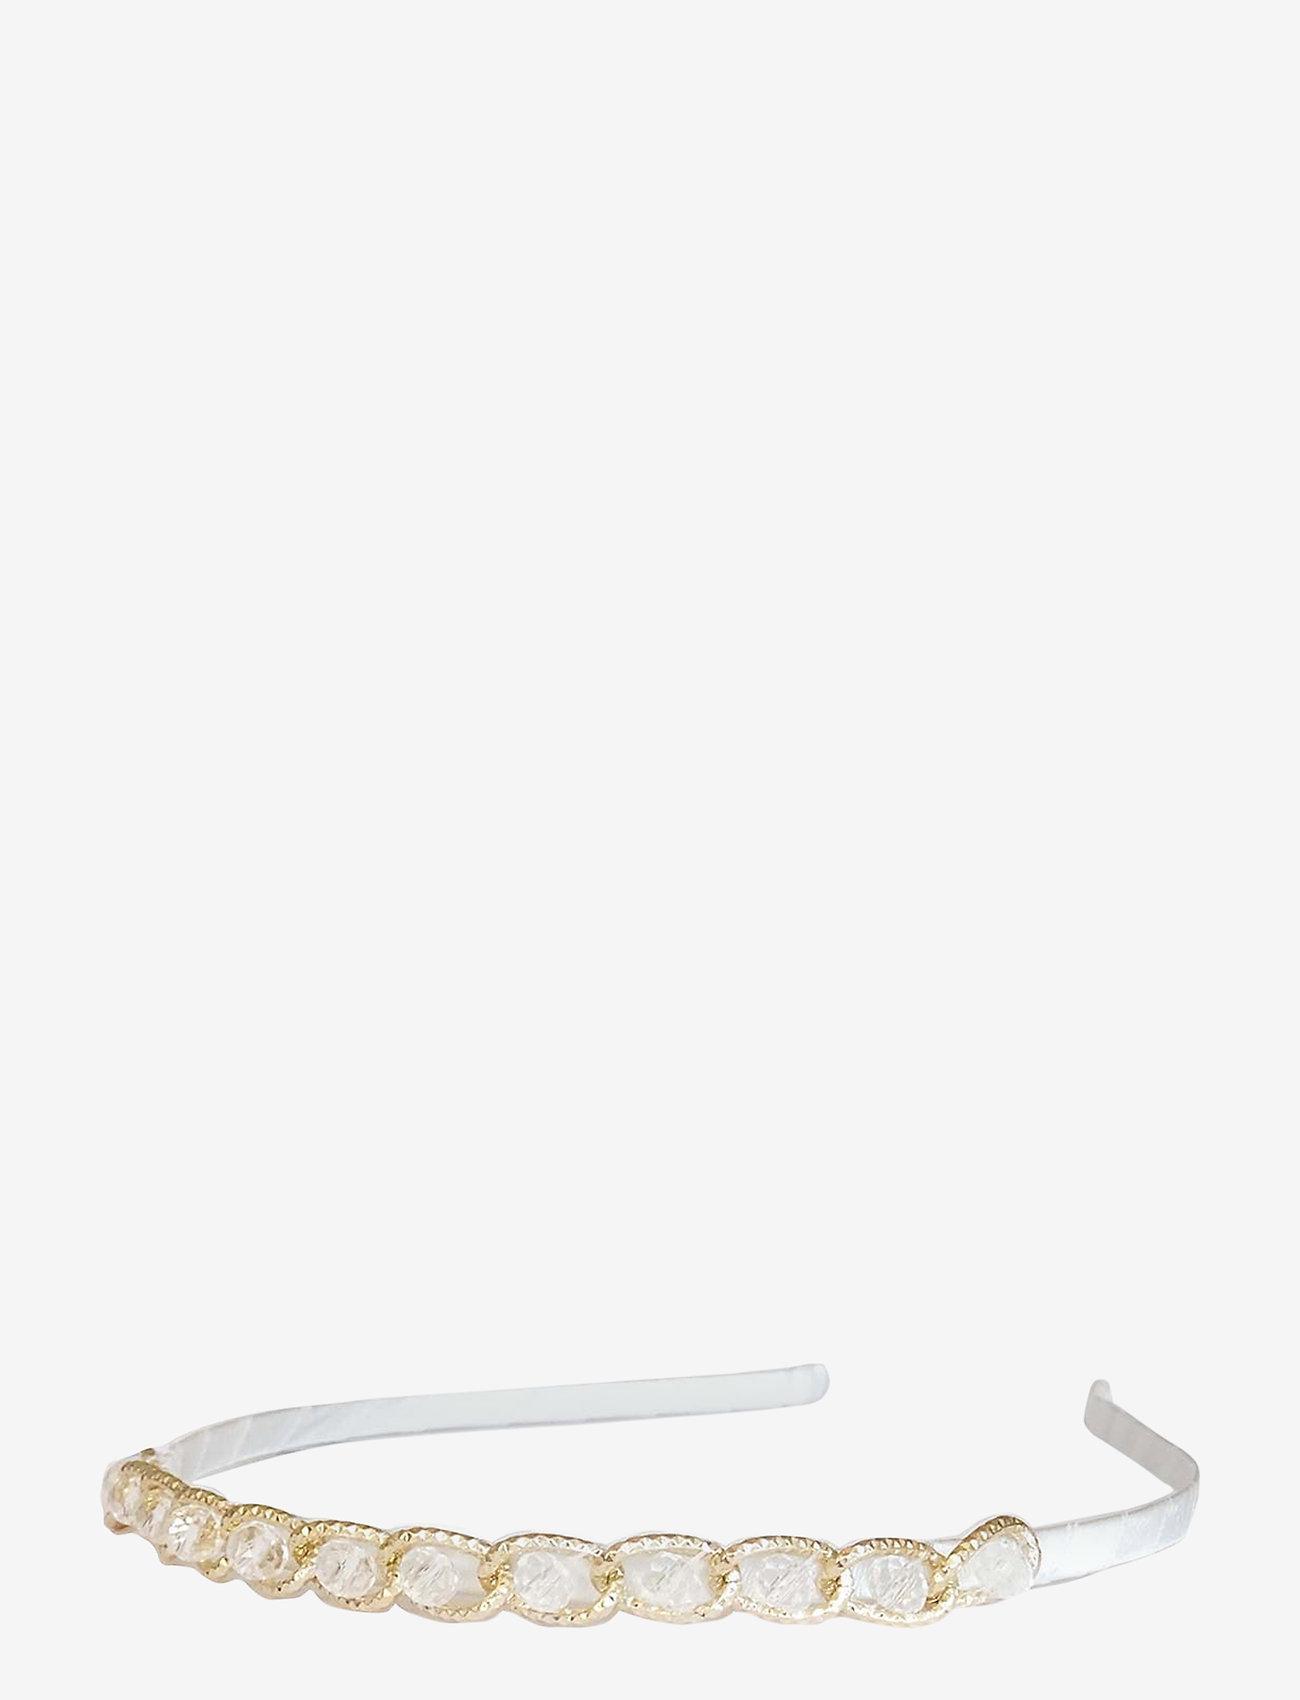 PIPOL'S BAZAAR - Sissi Diadema Crystal Gold - haar accessoires - gold - 0